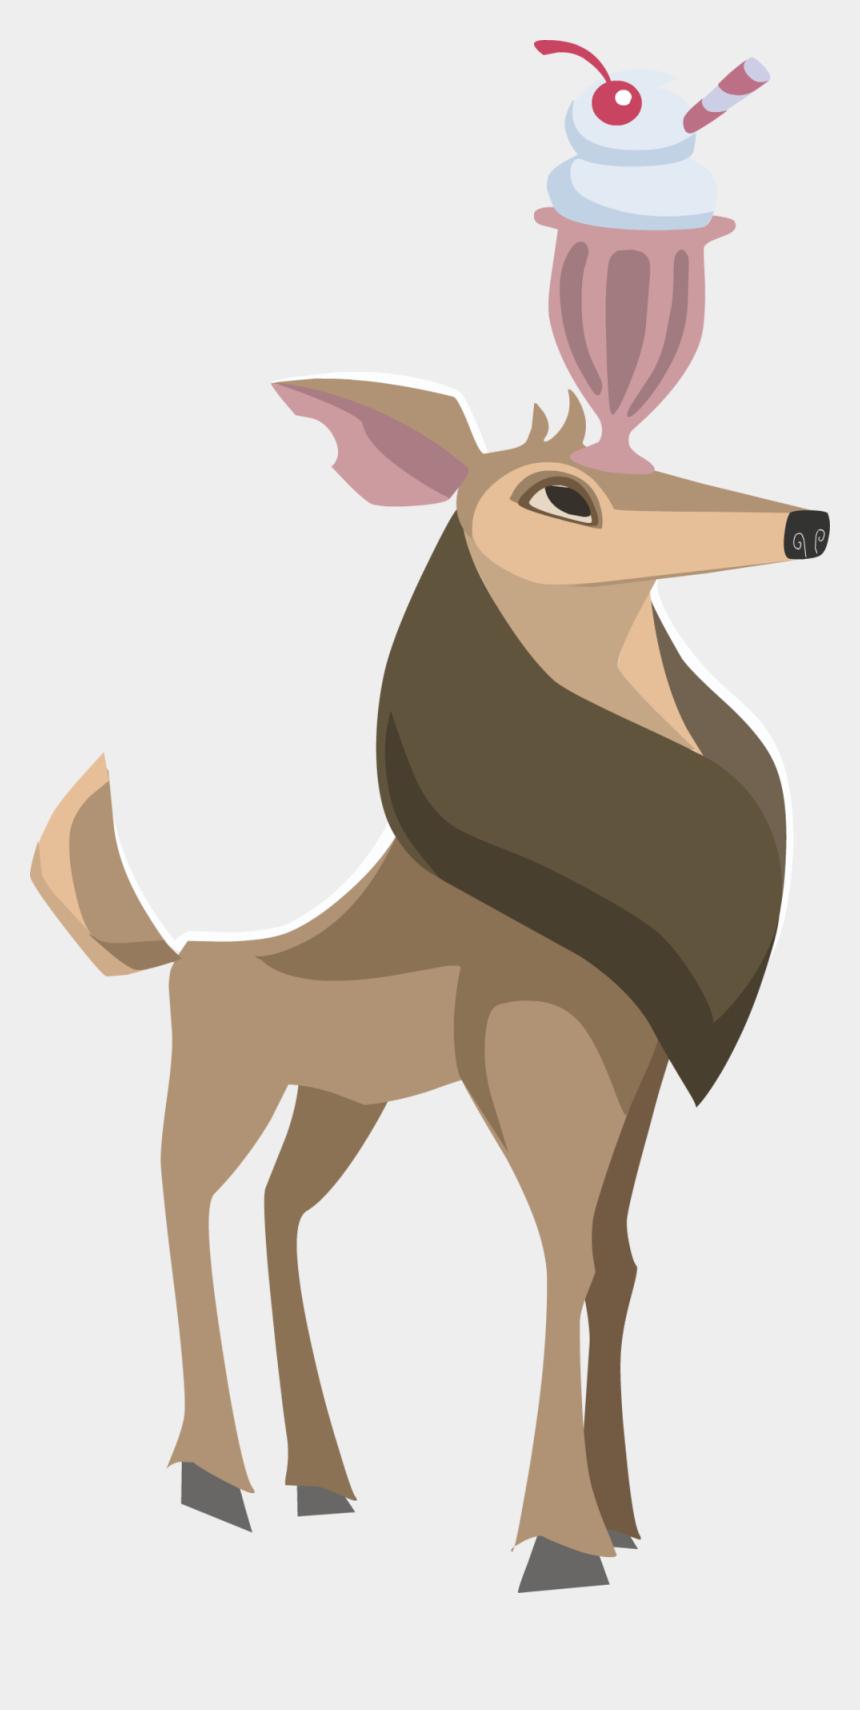 animal jam clipart, Cartoons - Deer